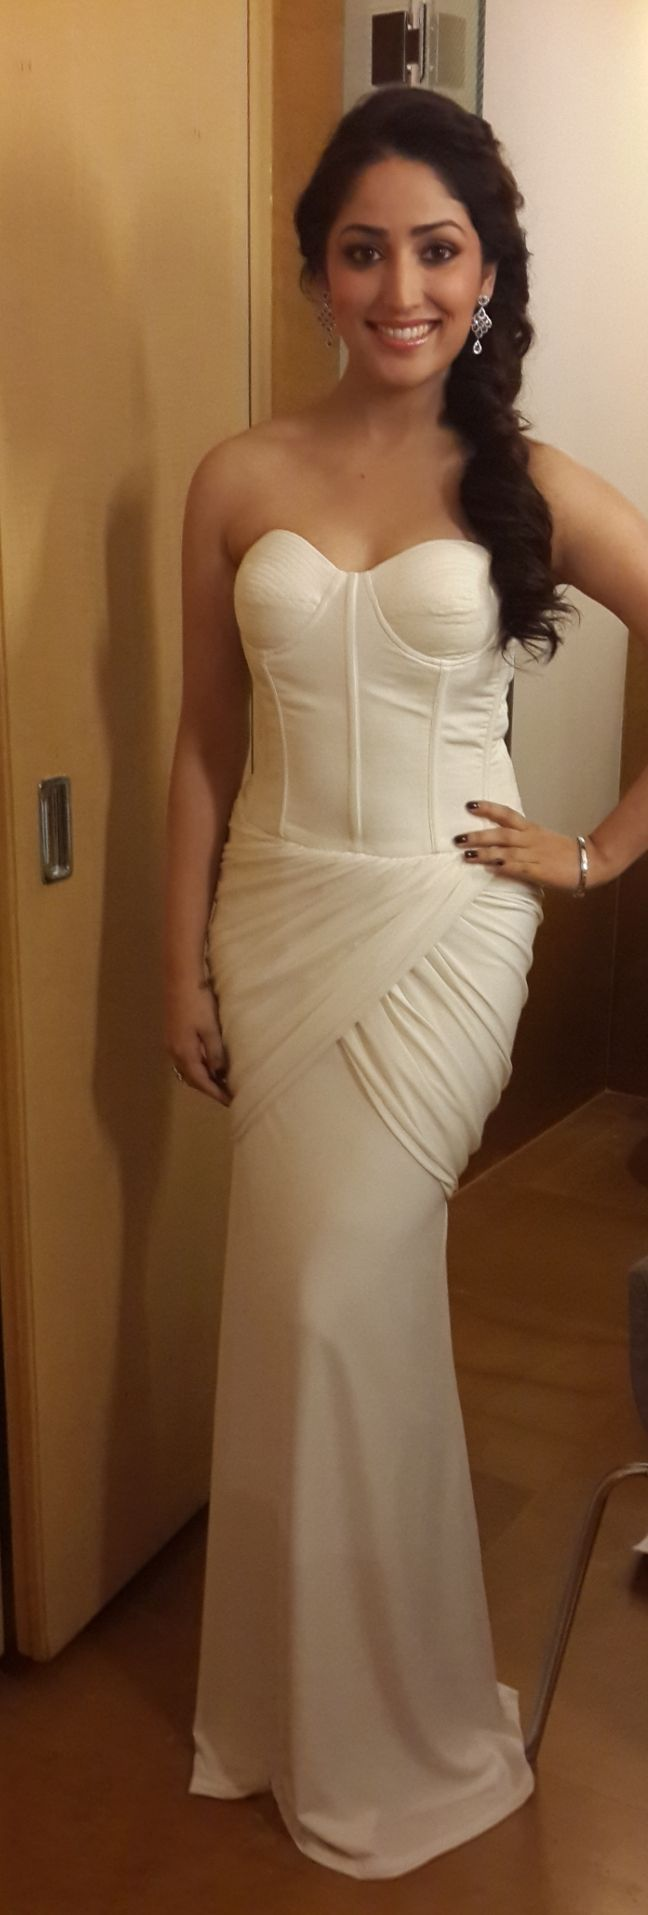 Yami Gautam looked ravishing in a Sonaakshi Raaj gown at the Retail Jeweller India Awards. #Bollywood #Fashion #Style #Beauty